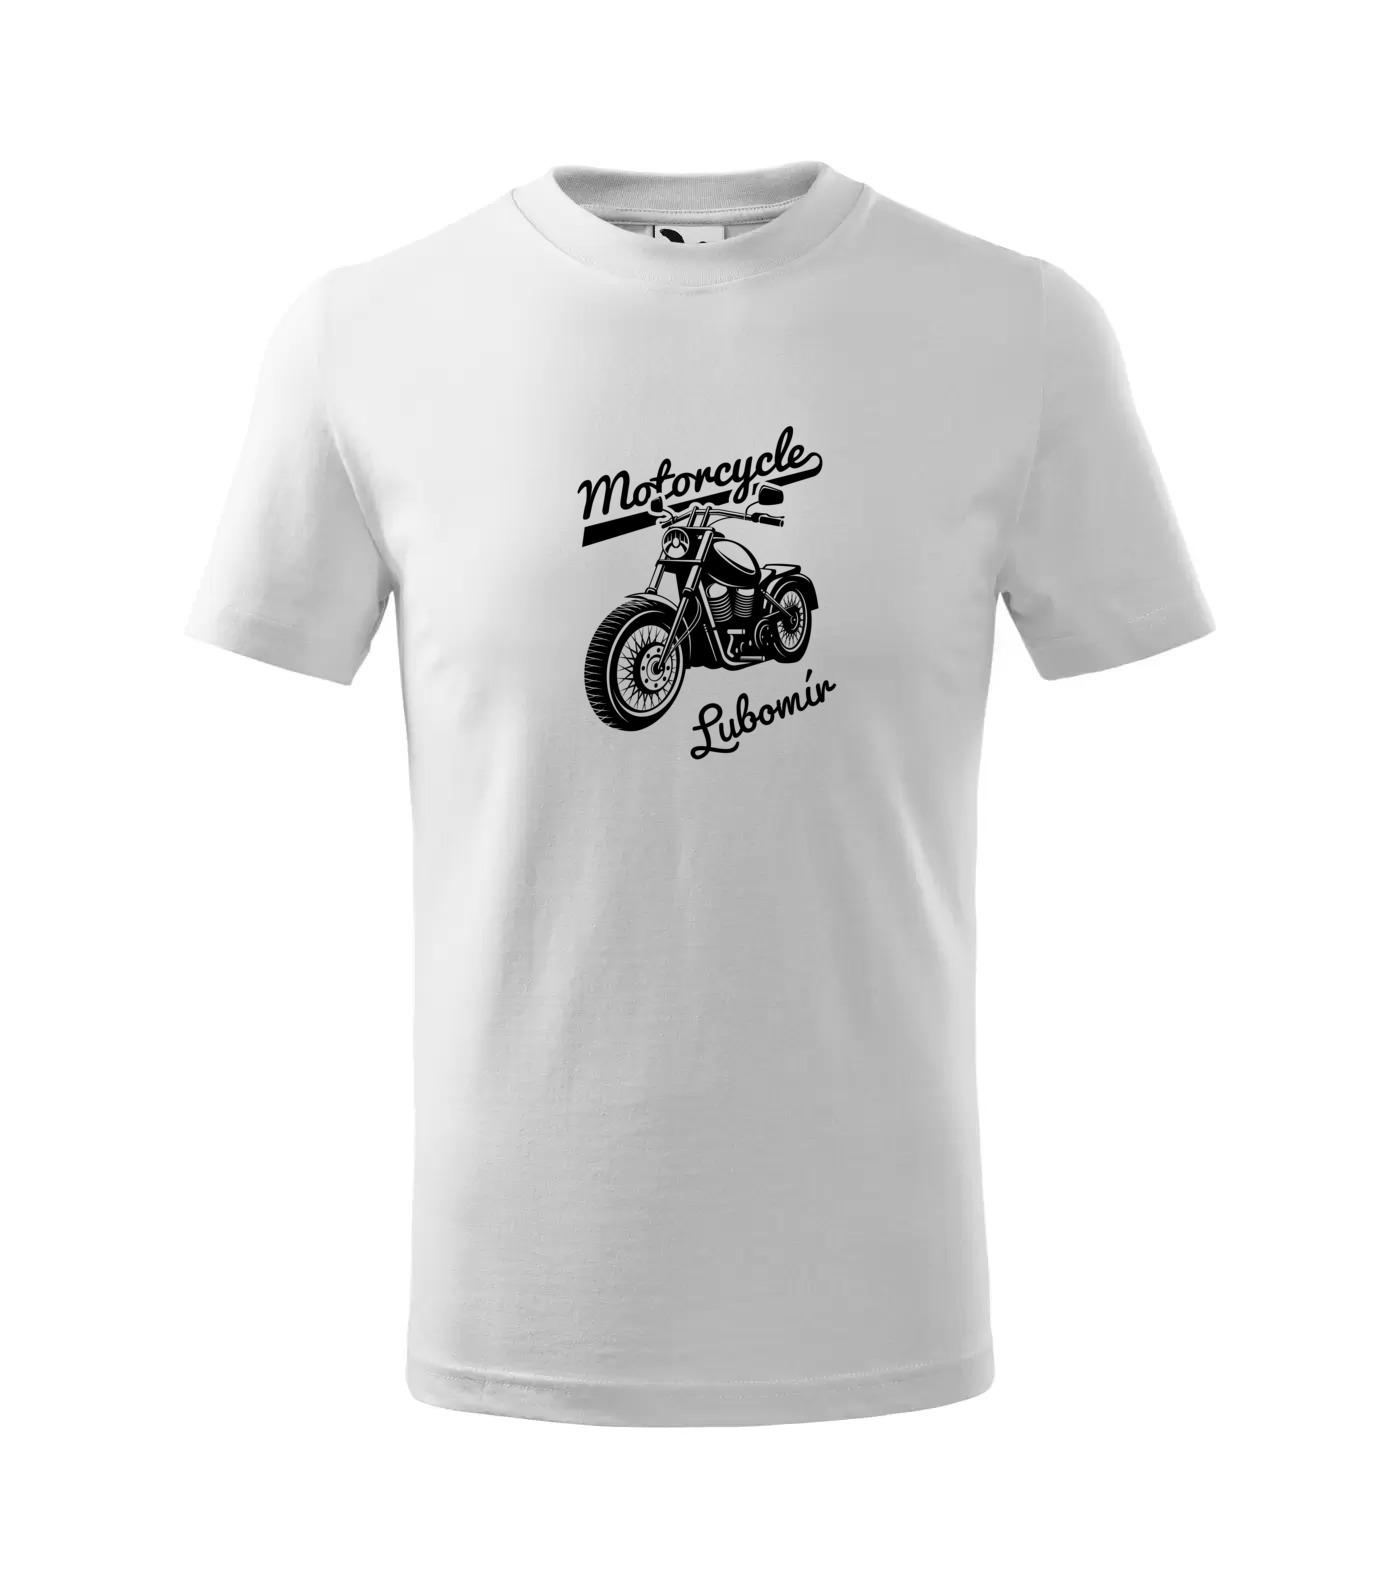 Tričko Motorkář Inverse Lubomír